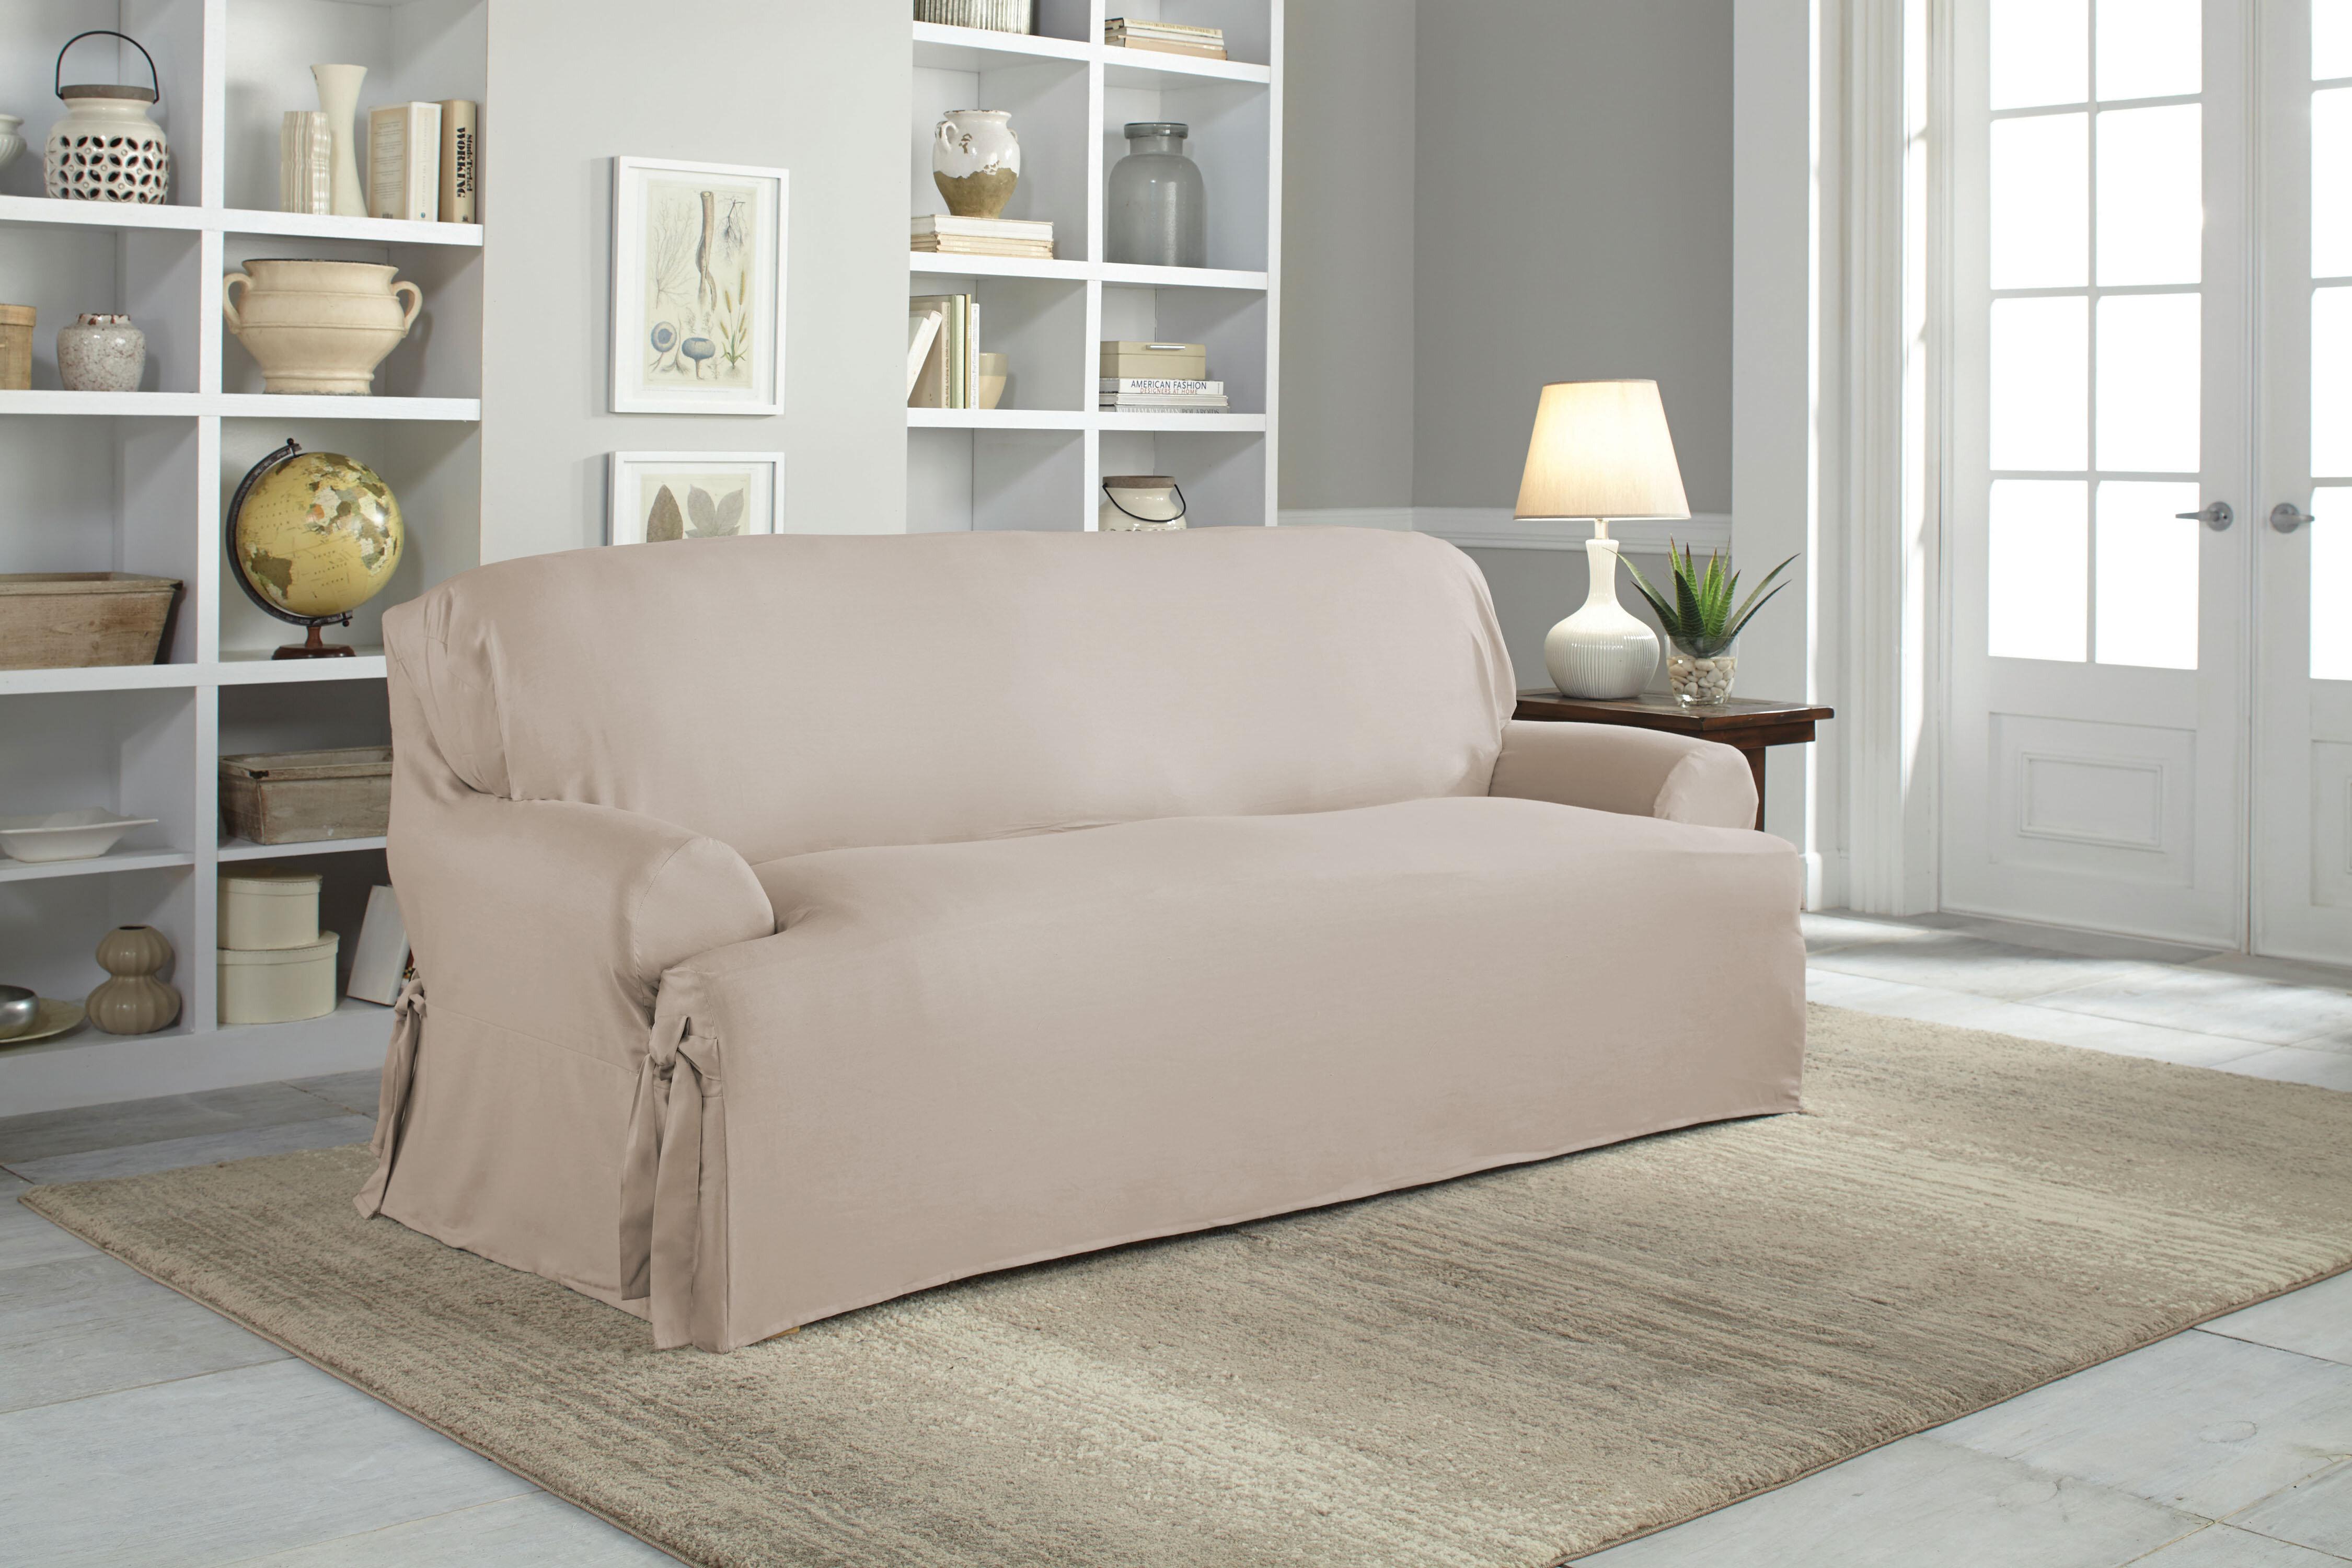 Incredible Cotton Duck T Cushion Sofa Slipcover Interior Design Ideas Grebswwsoteloinfo